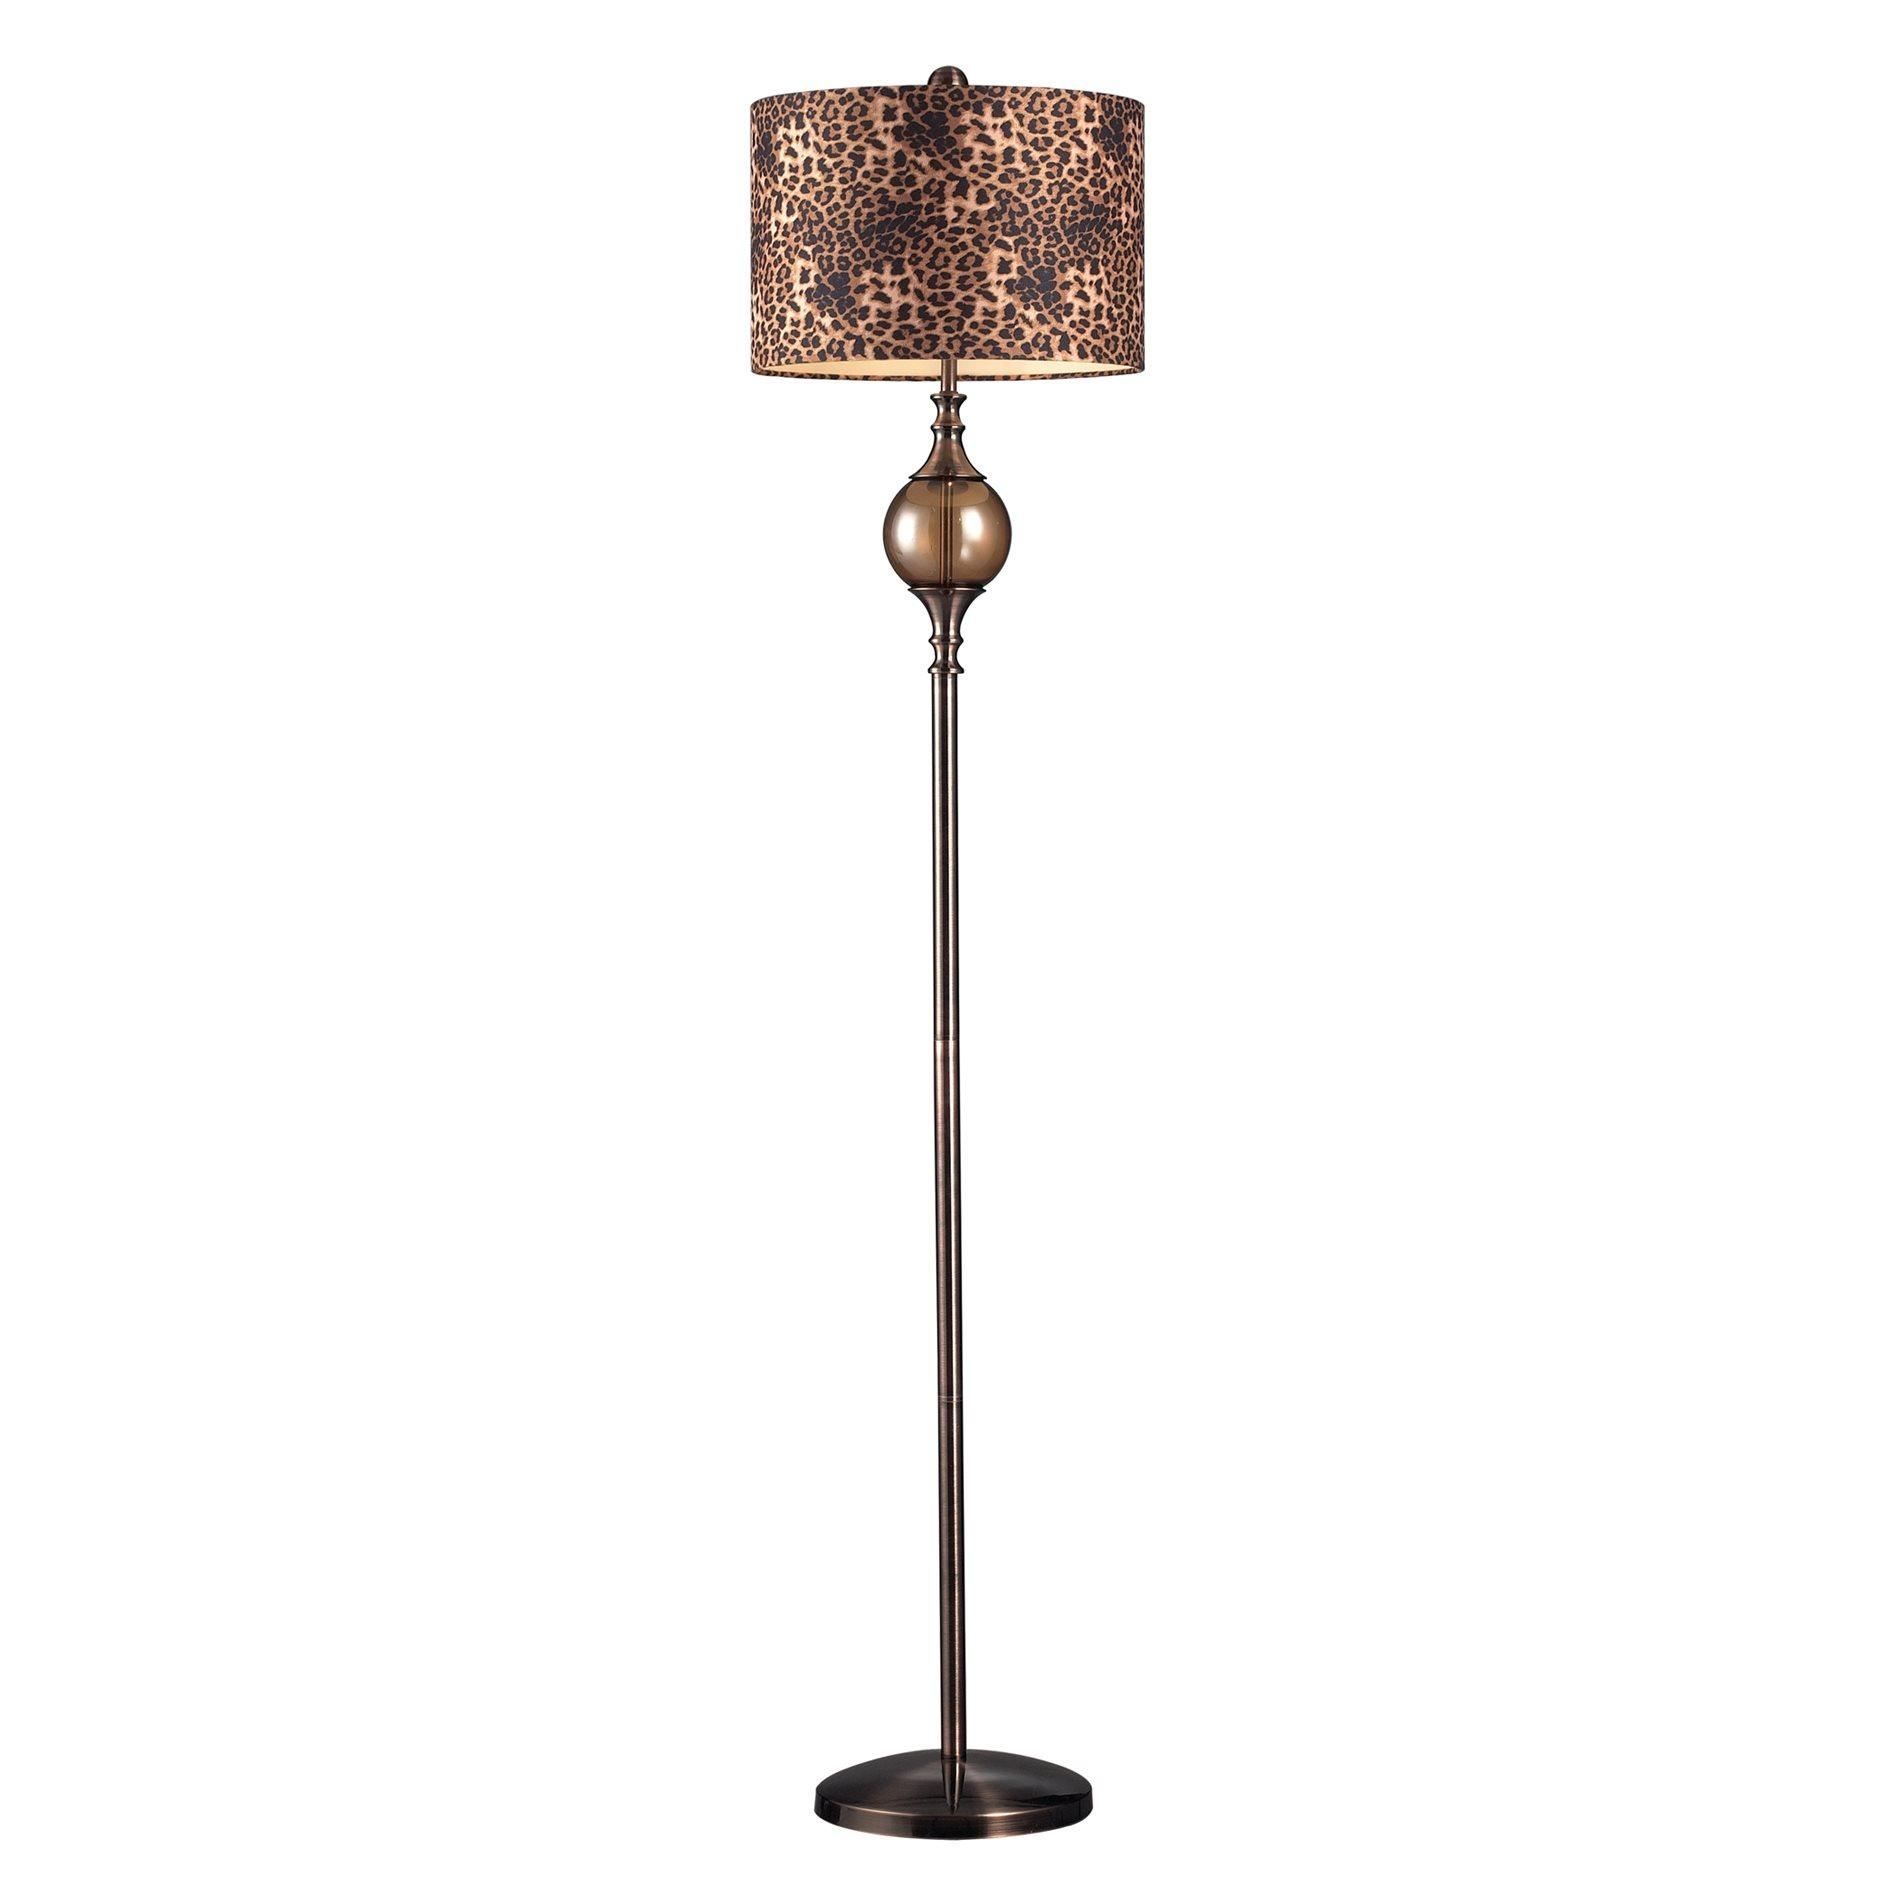 Dimond 111-1098 Alliance Transitional Floor Lamp STI-111-1098